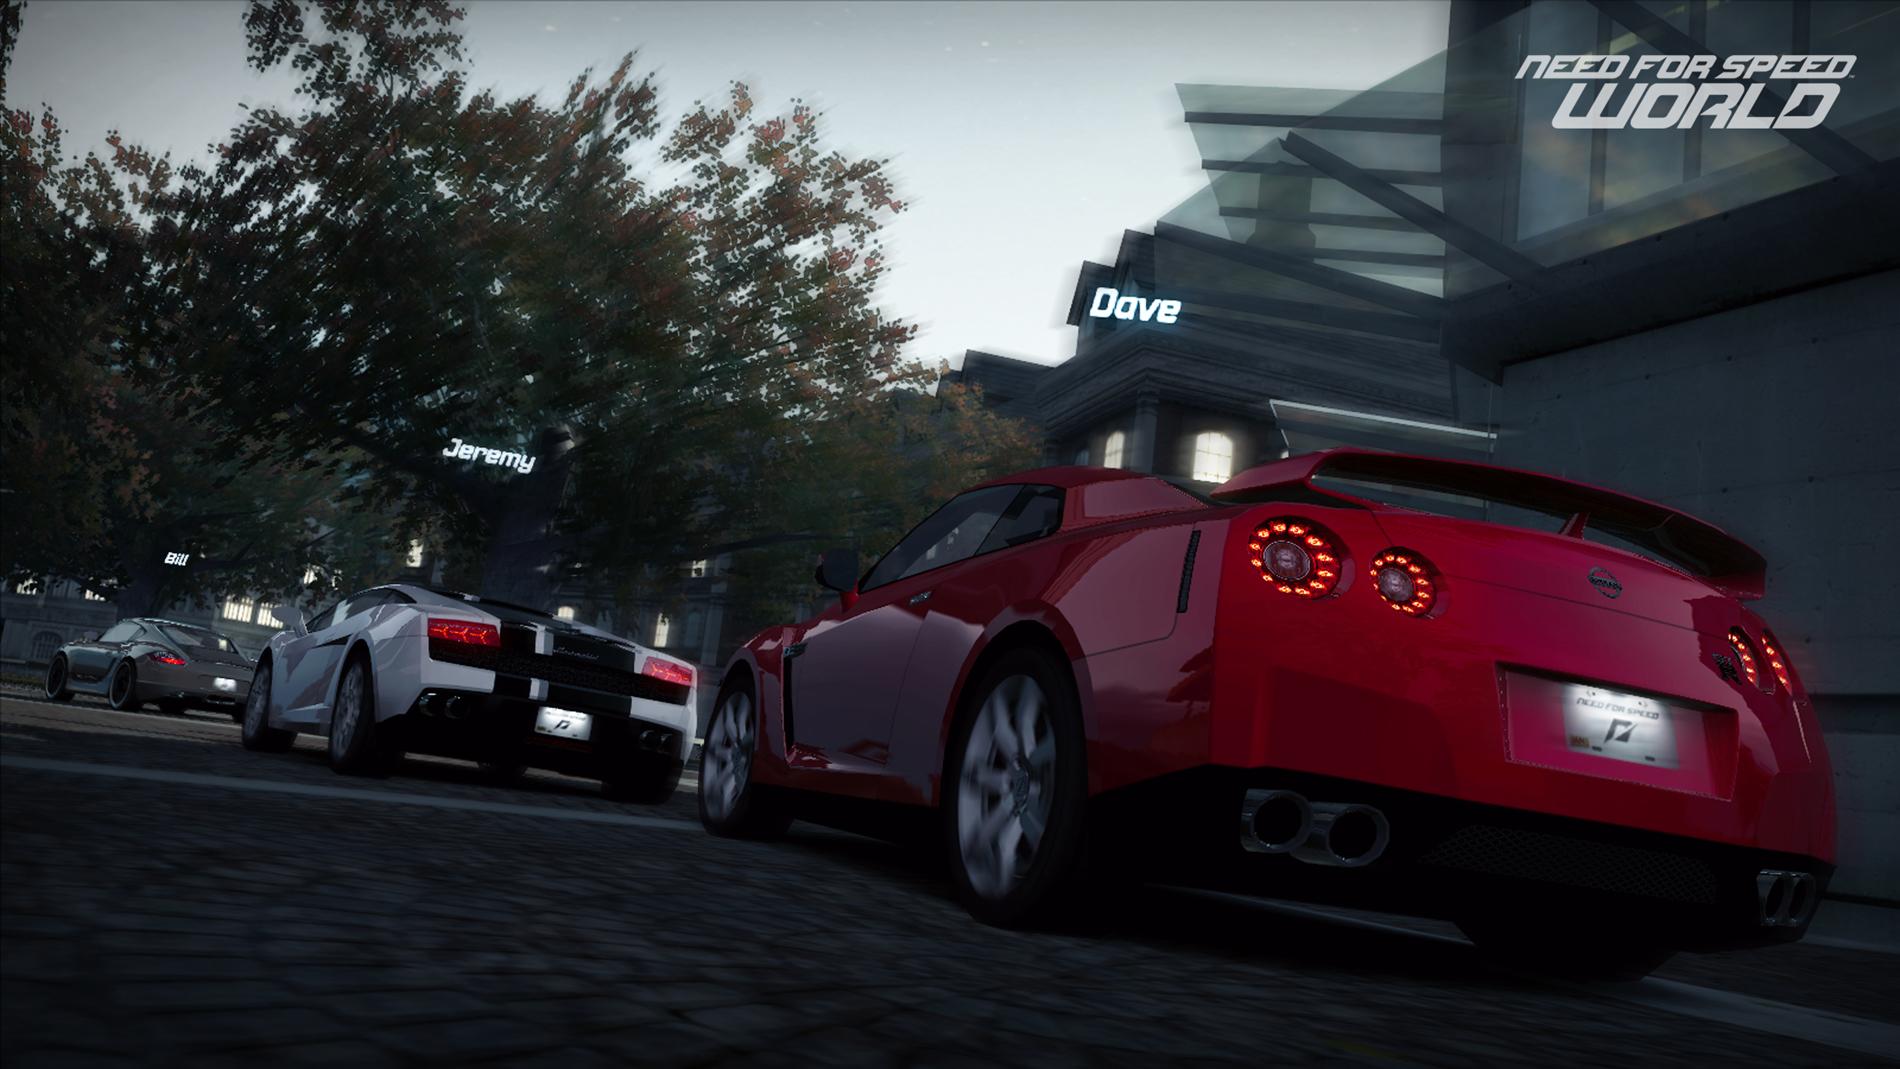 Need for Speed World nodvd.